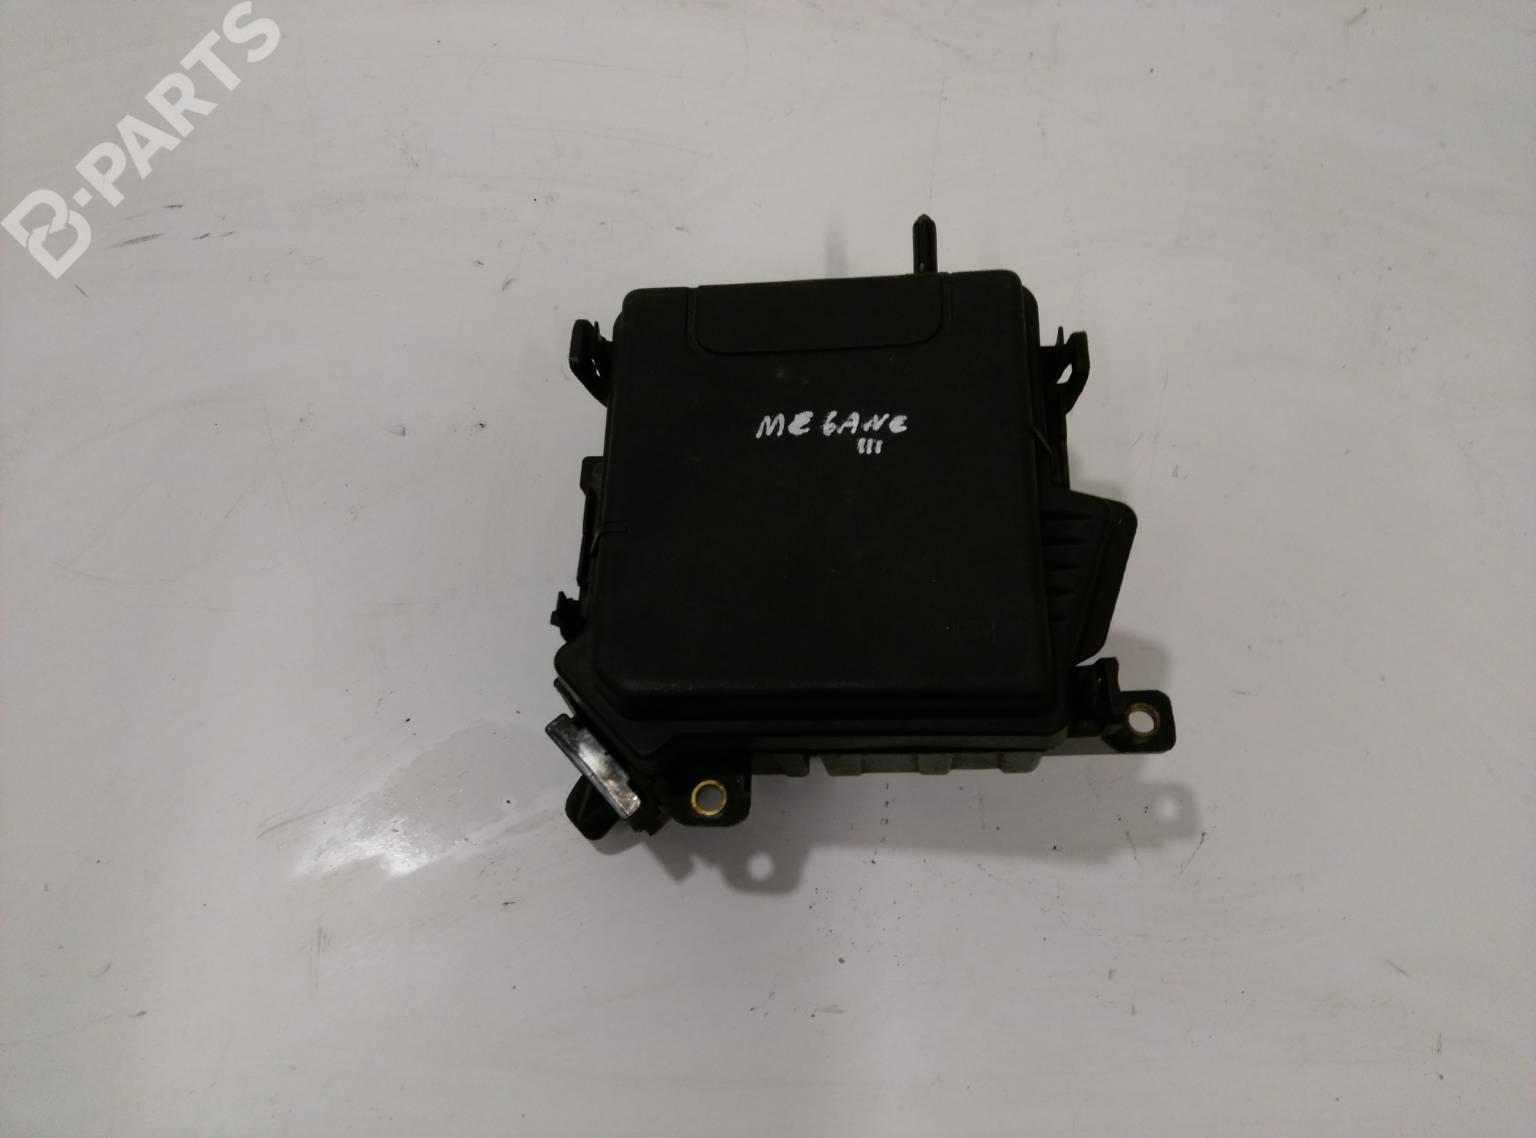 hight resolution of fuse box 284b10002r 284c40002r renault megane iii grandtour kz0 1 1 5